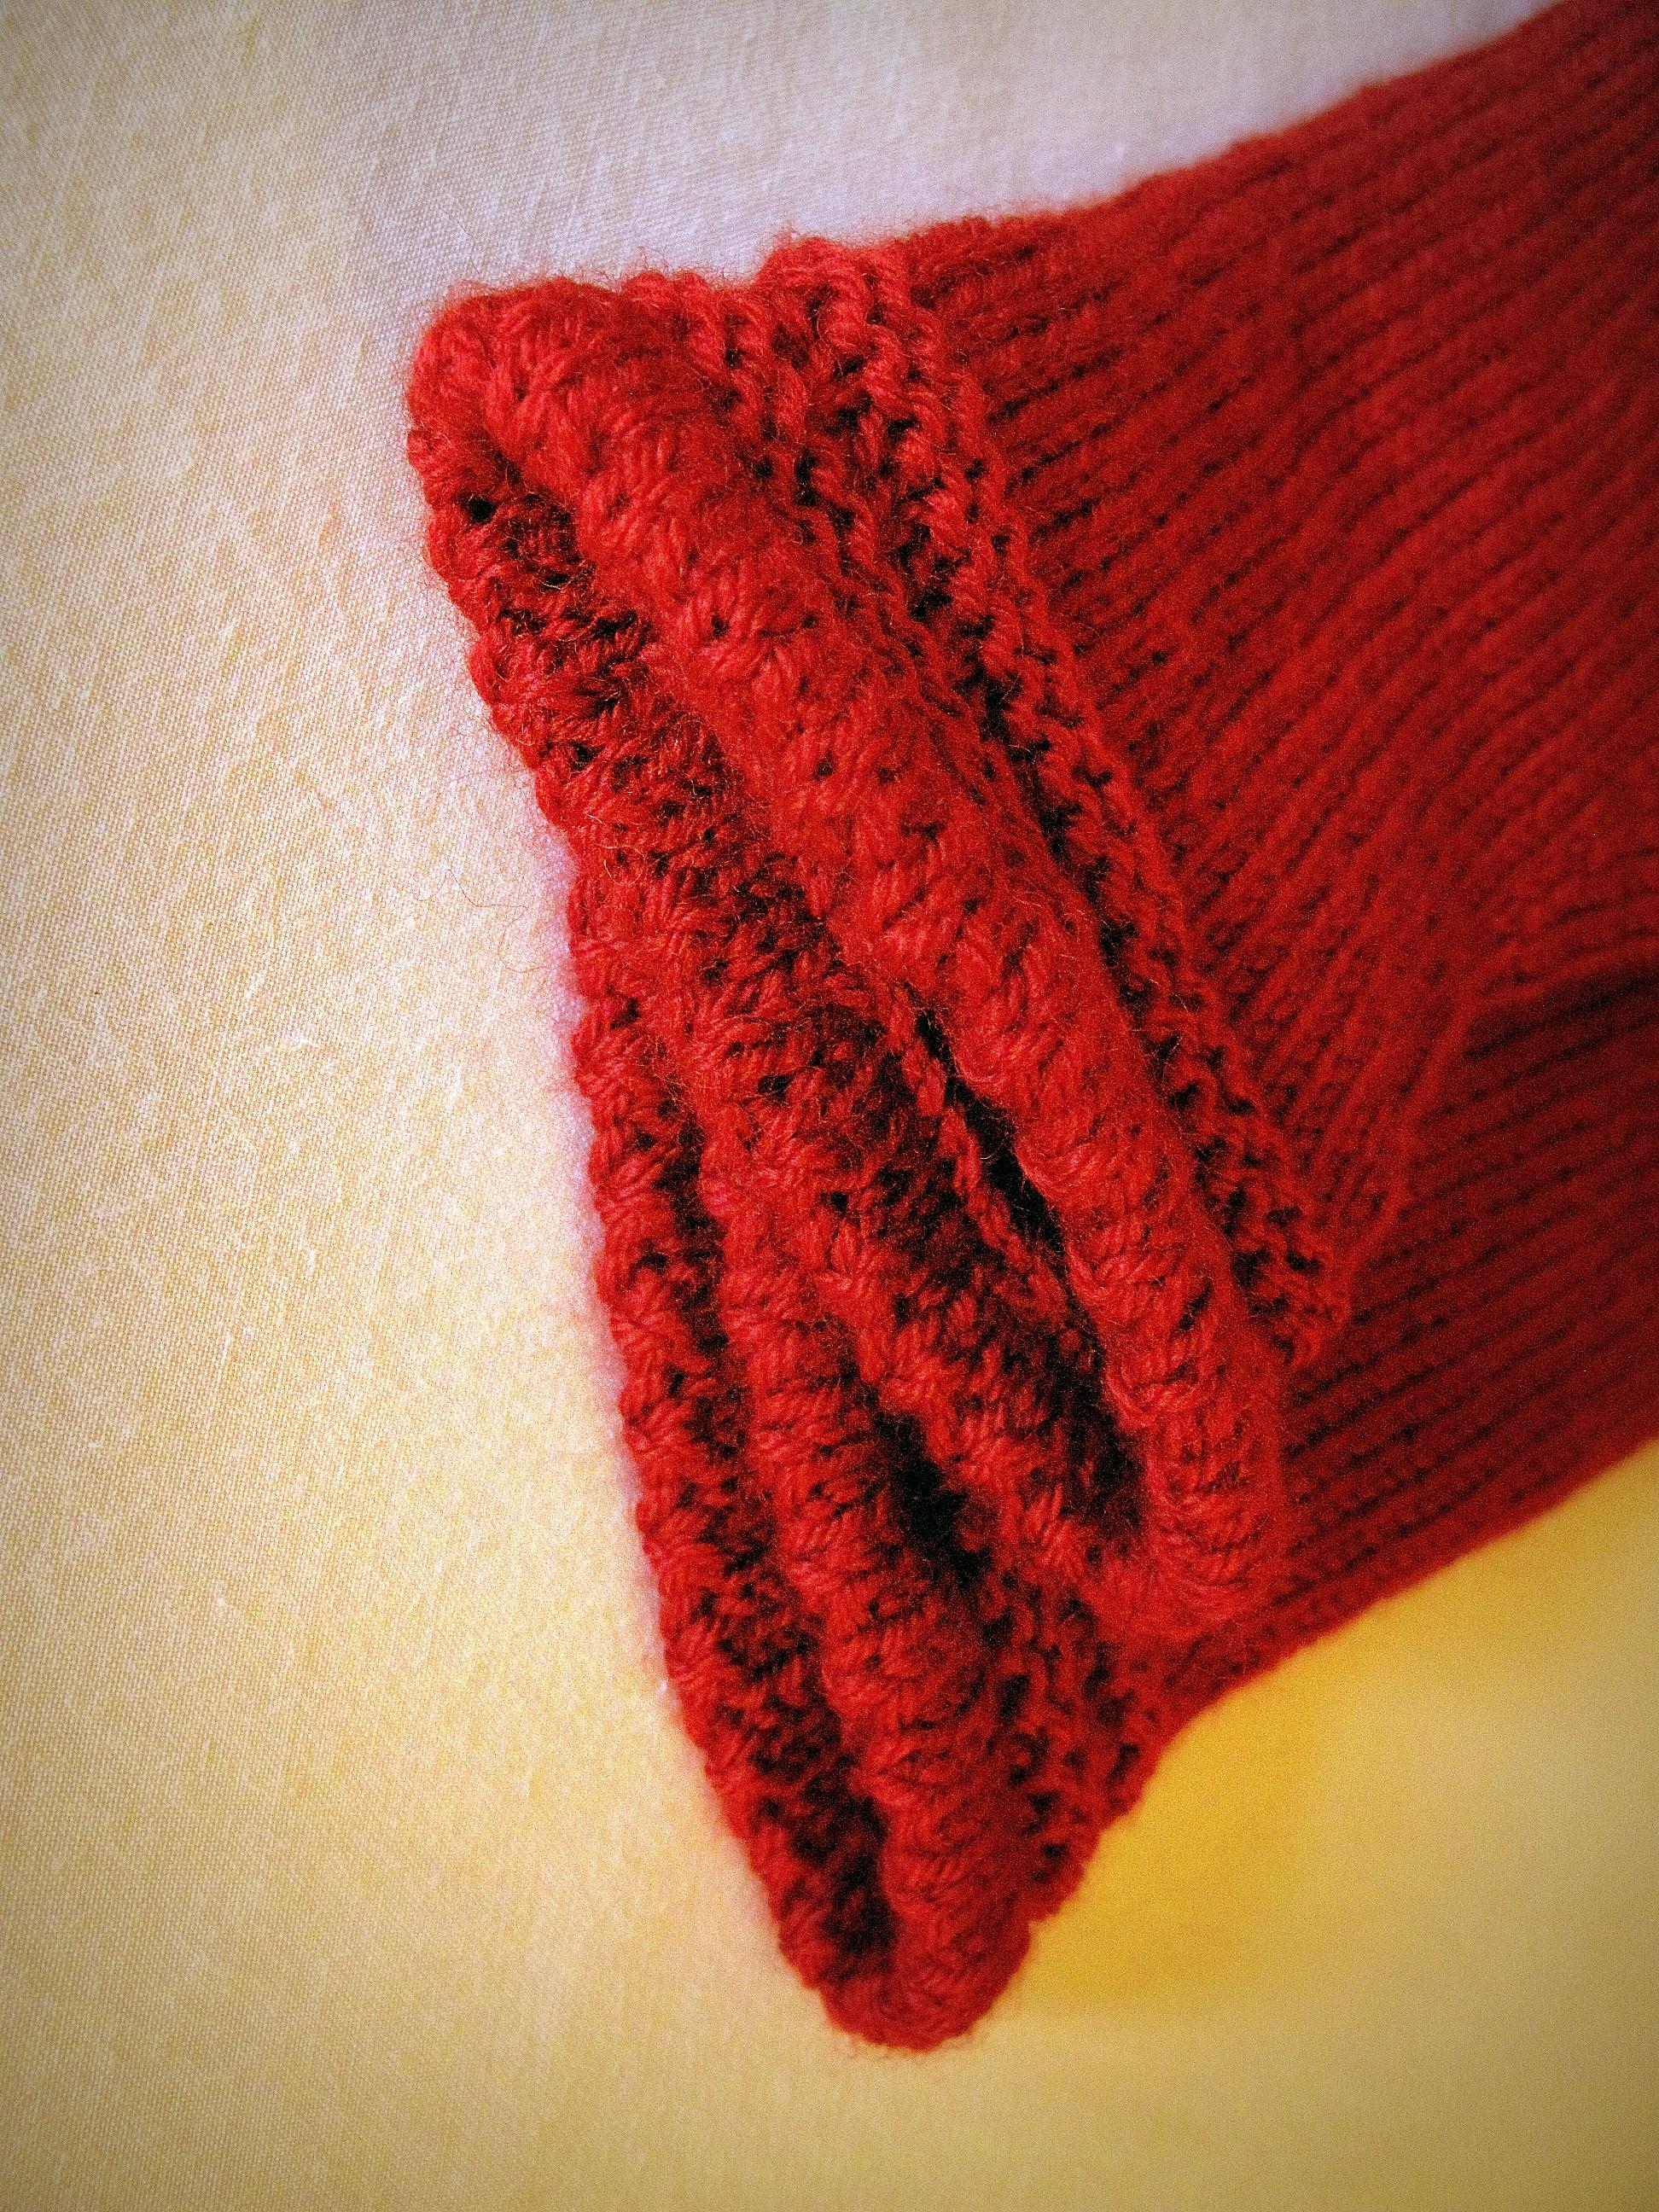 Fotos gratis : pétalo, rojo, otoño, ropa, paño, lana, tejer, tejido ...